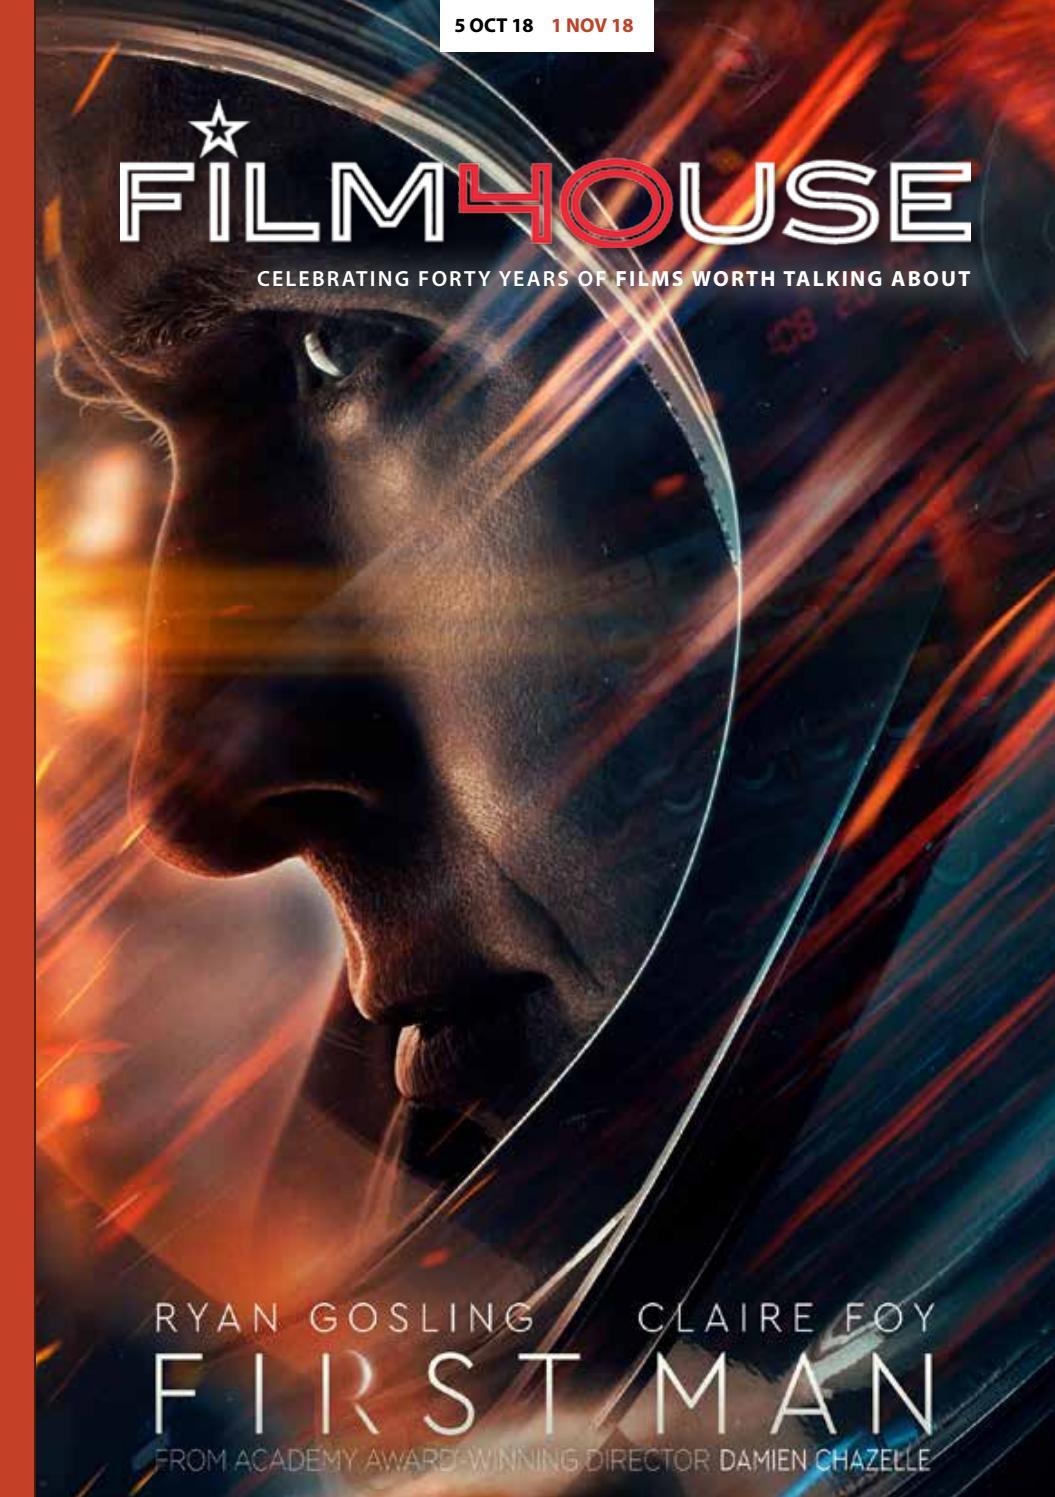 Filmhouse Brochure - October 2018